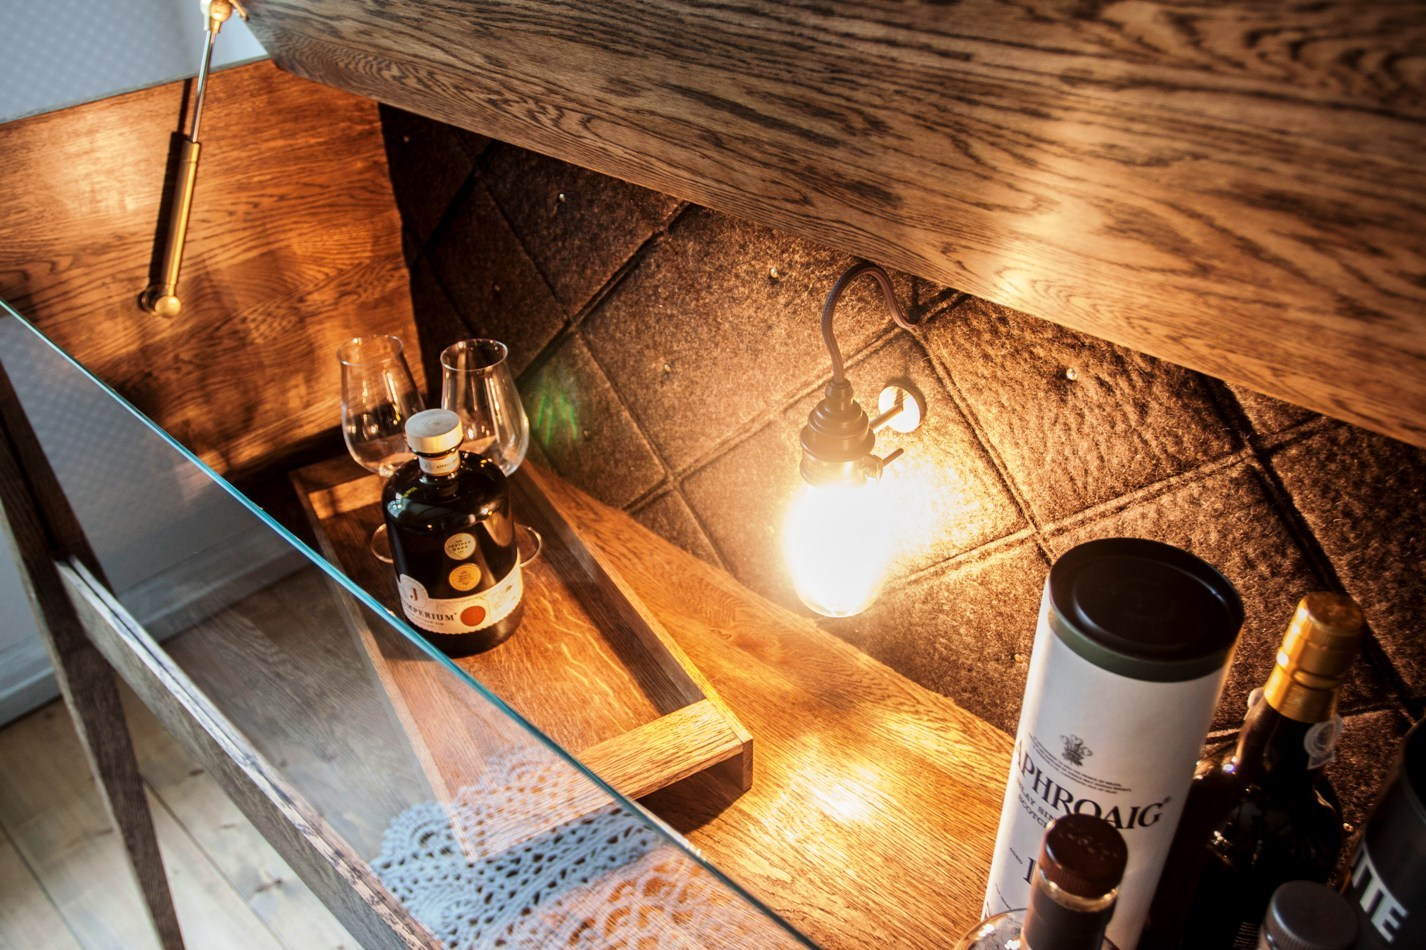 bar-cabinet-minibar-home-bar-sideboard-buffet-baarikapp-whiskey-bar-cabinet-mid-century-19_9554_1